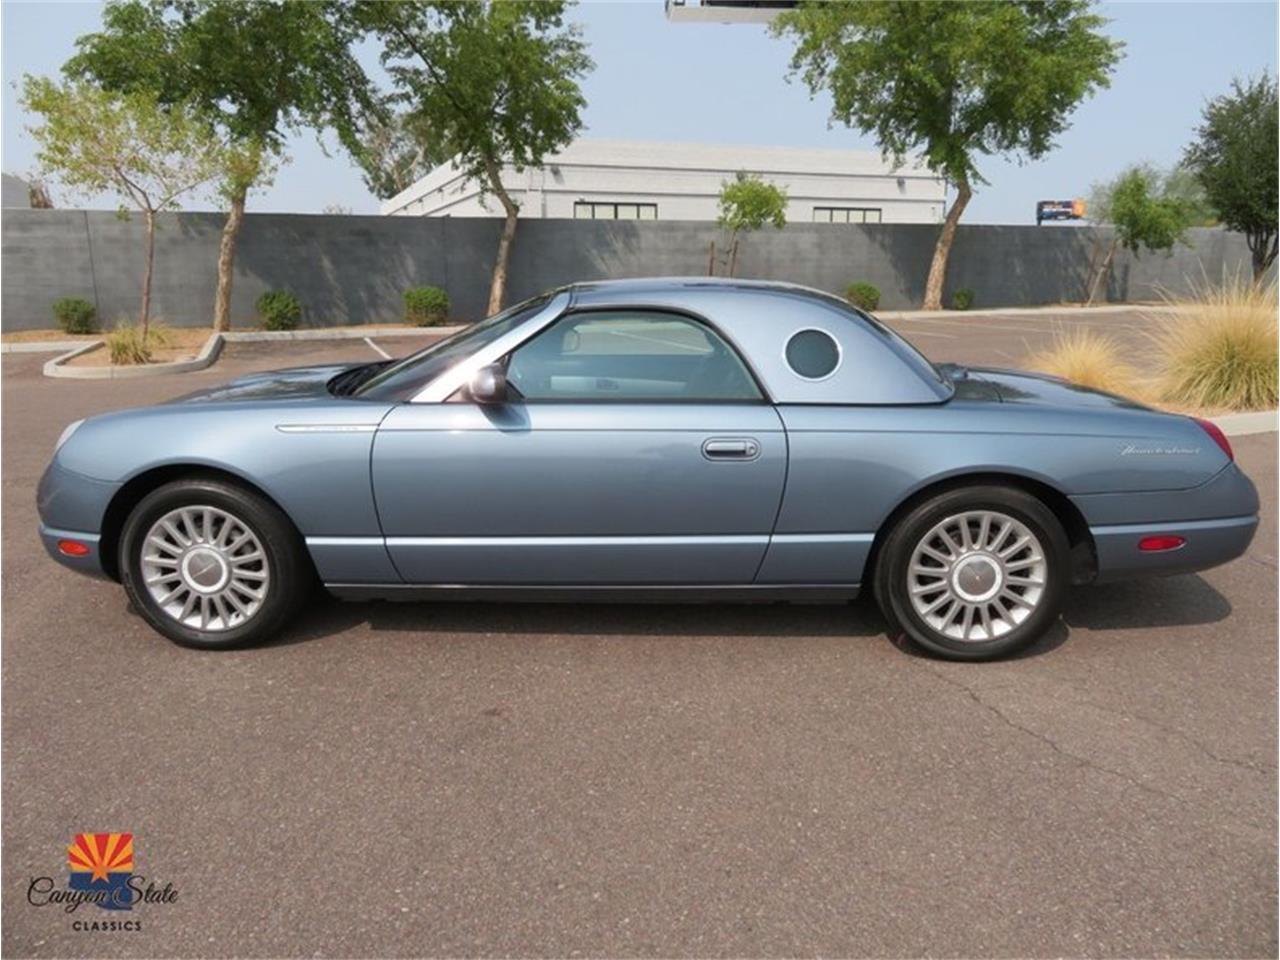 2005 Ford Thunderbird (CC-1389837) for sale in Tempe, Arizona